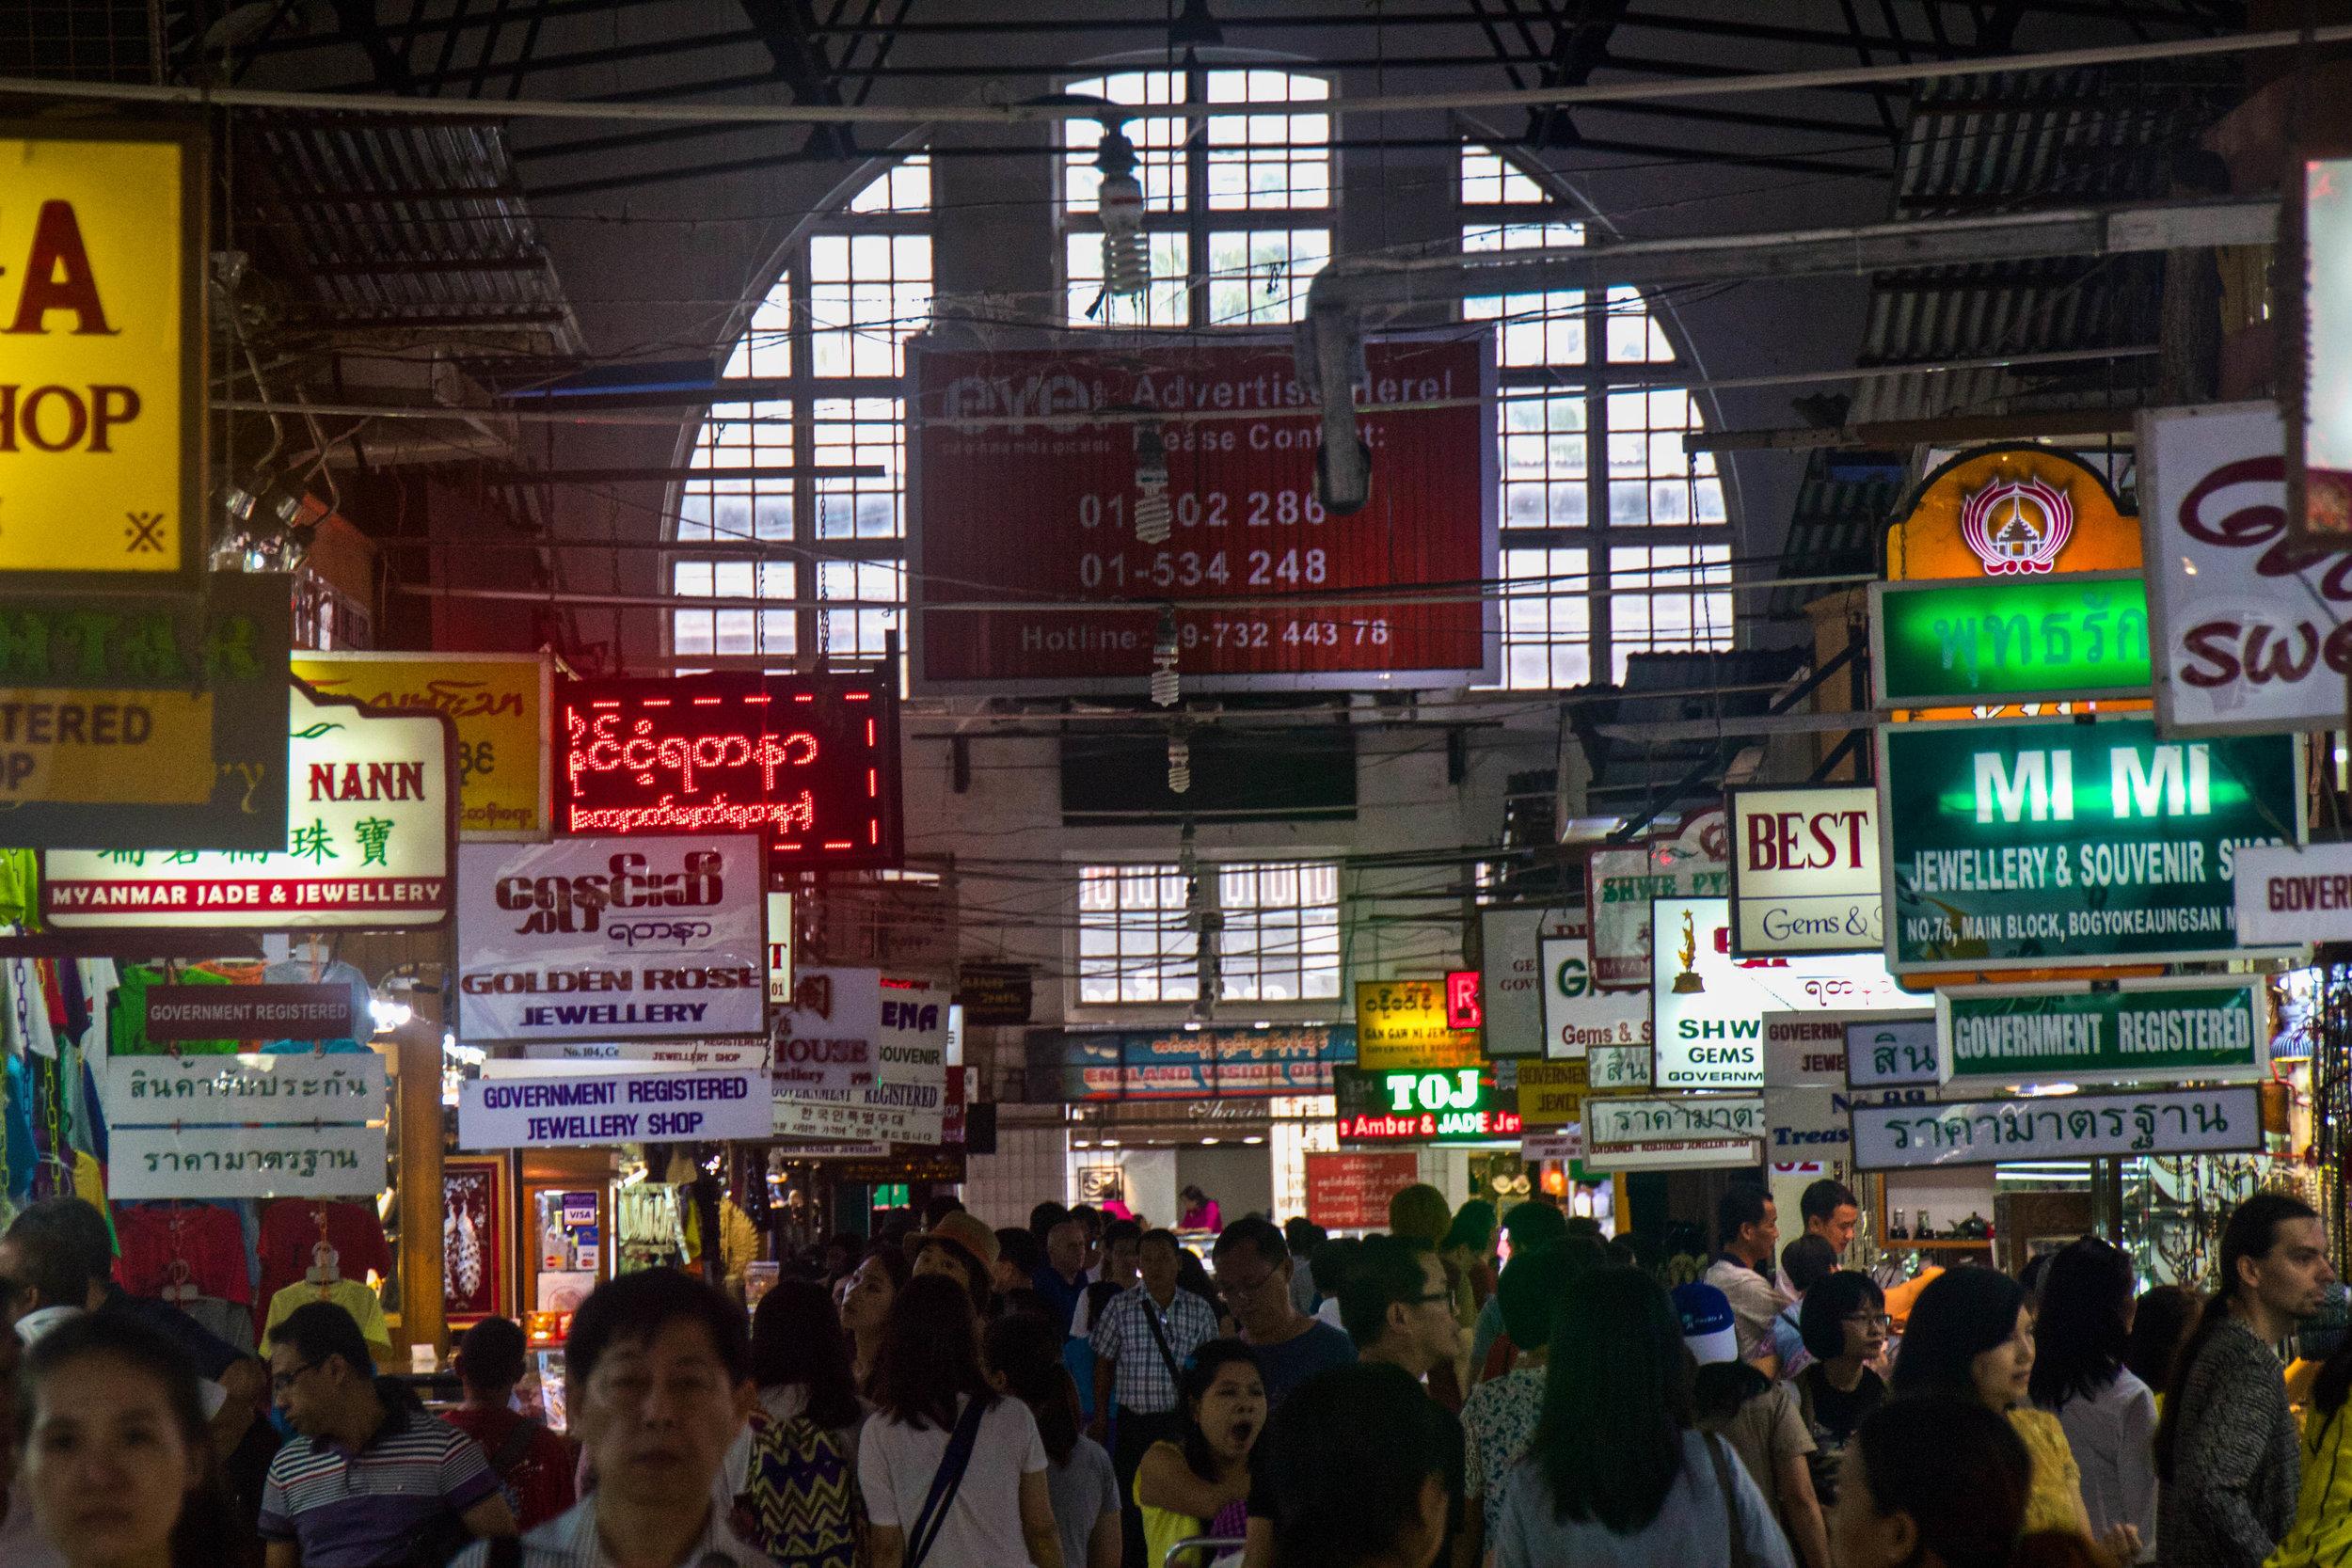 rangoon burma yangon myanmar 21-2.jpg